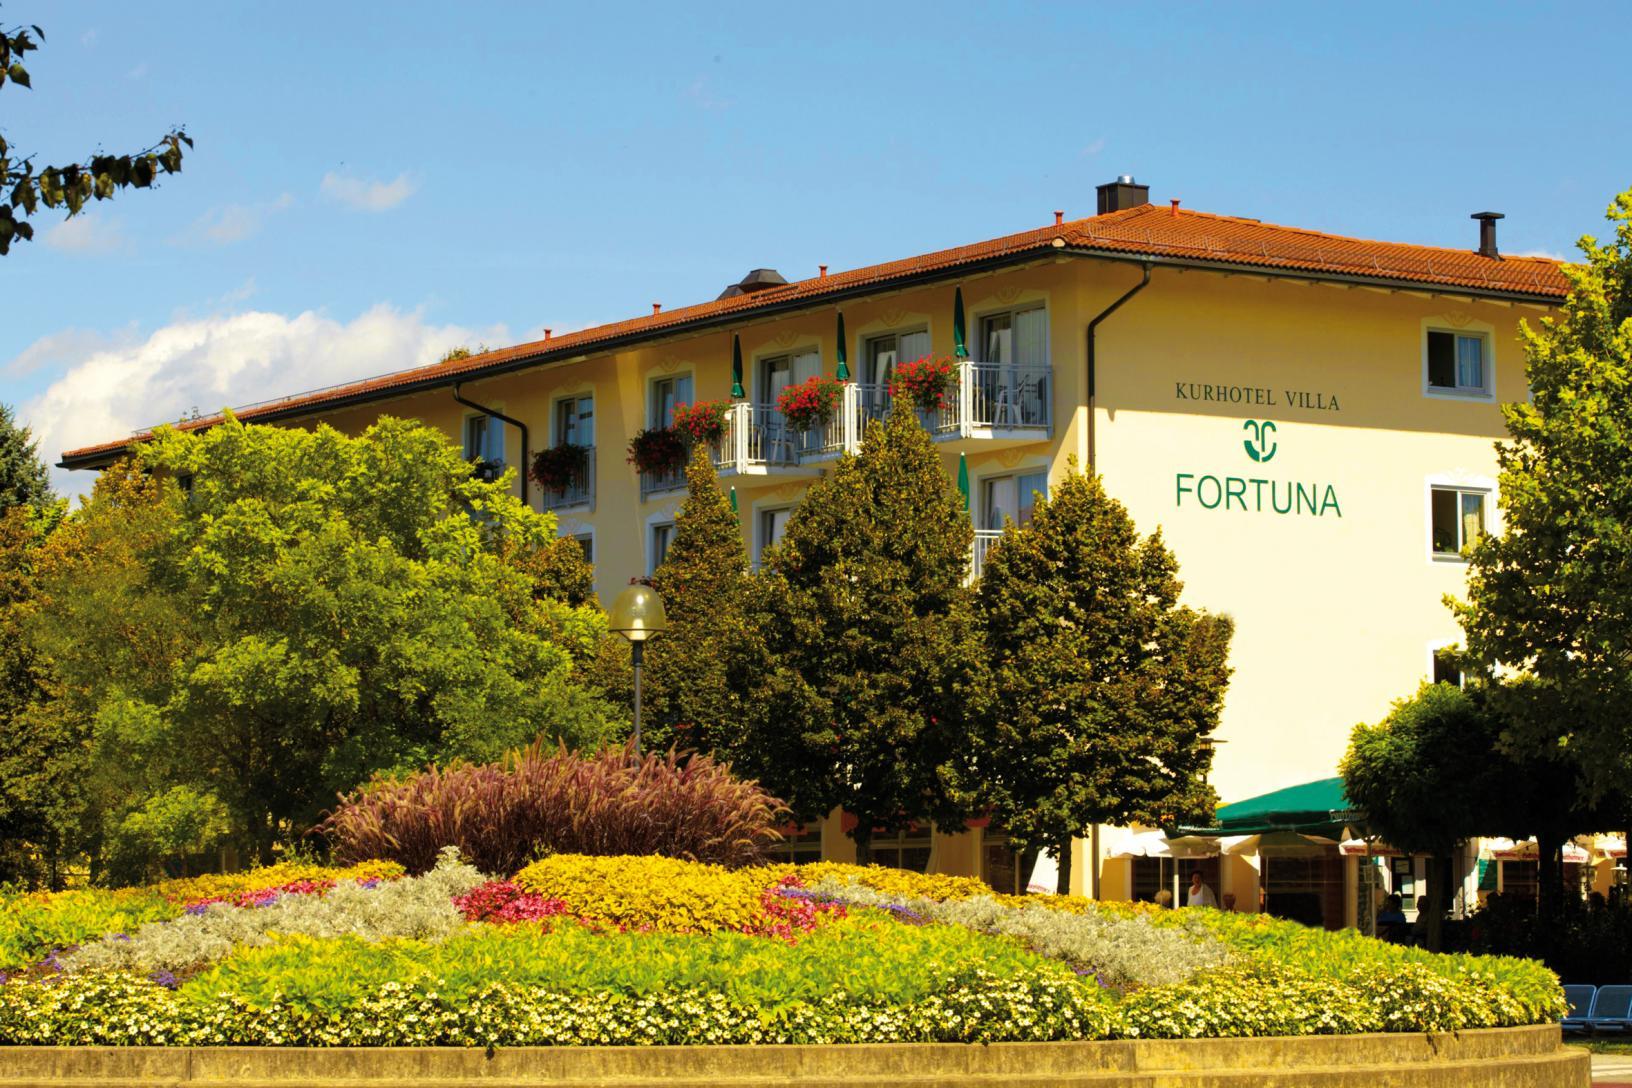 Kurhotel Villa Fortuna Bild2